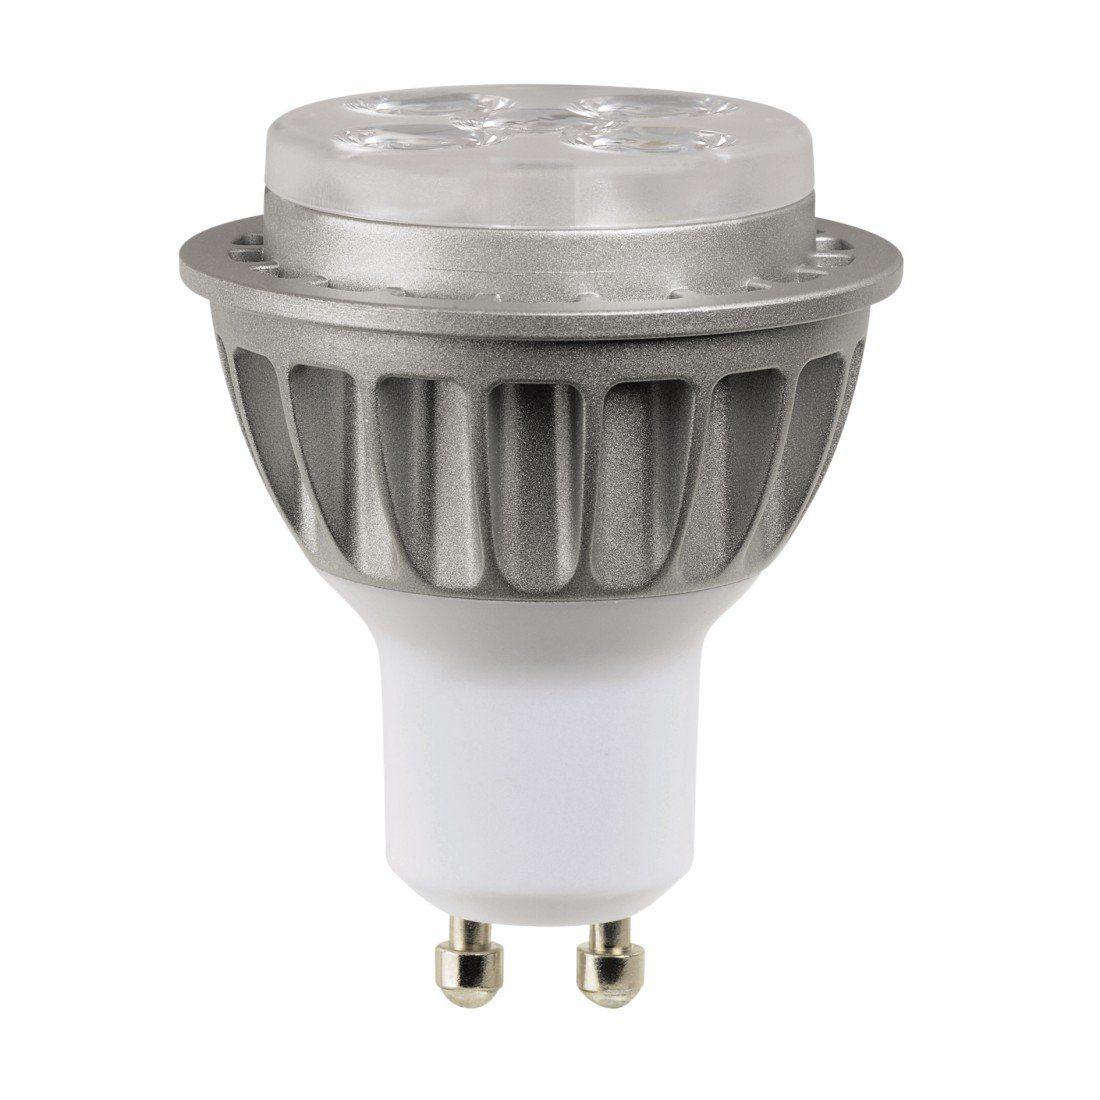 Xavax LED-Reflektorlampe, 7W, GU10, PAR16, dimmbar, Warmweiß